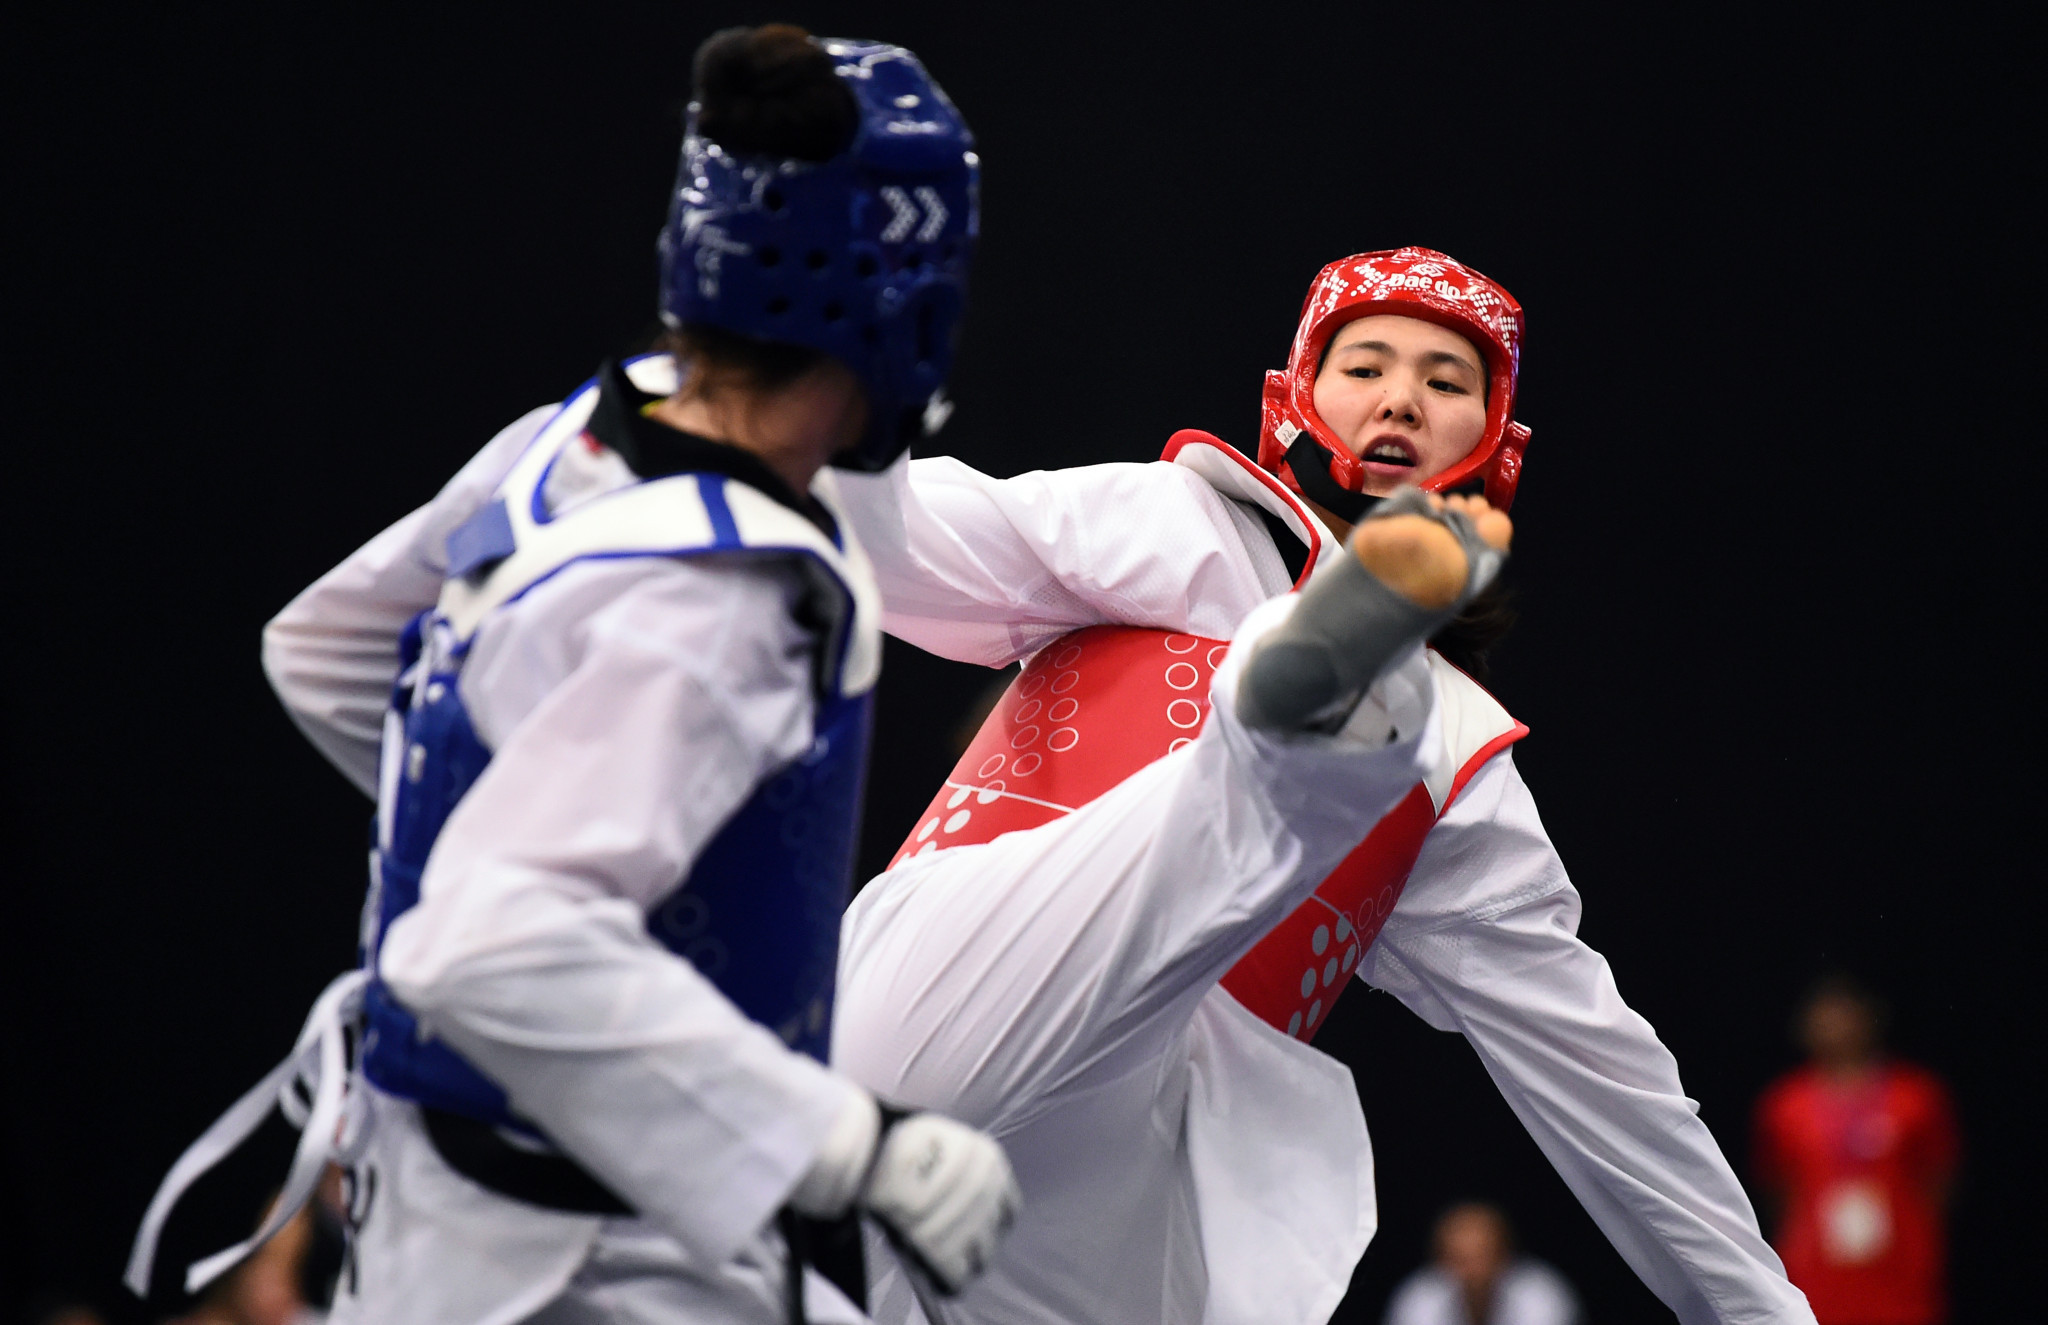 Further revenge for Zheng at World Taekwondo Grand Prix in Sofia